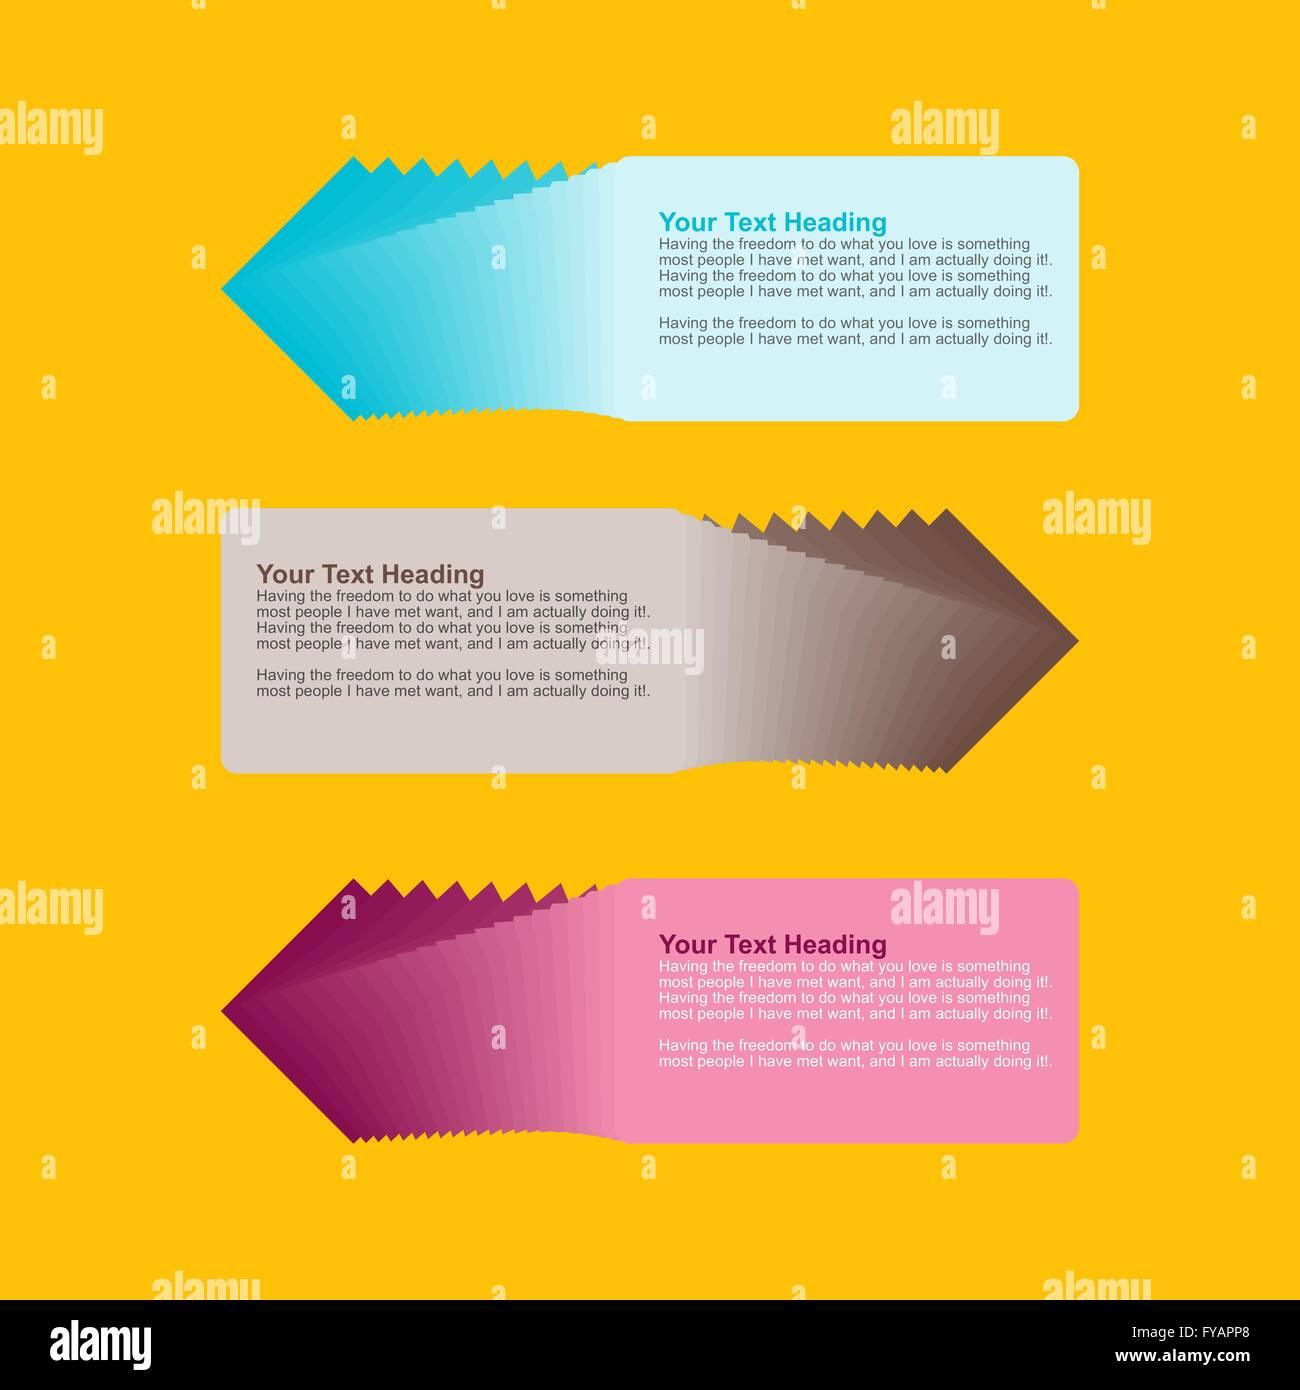 Infographics Design Template - Stock Image